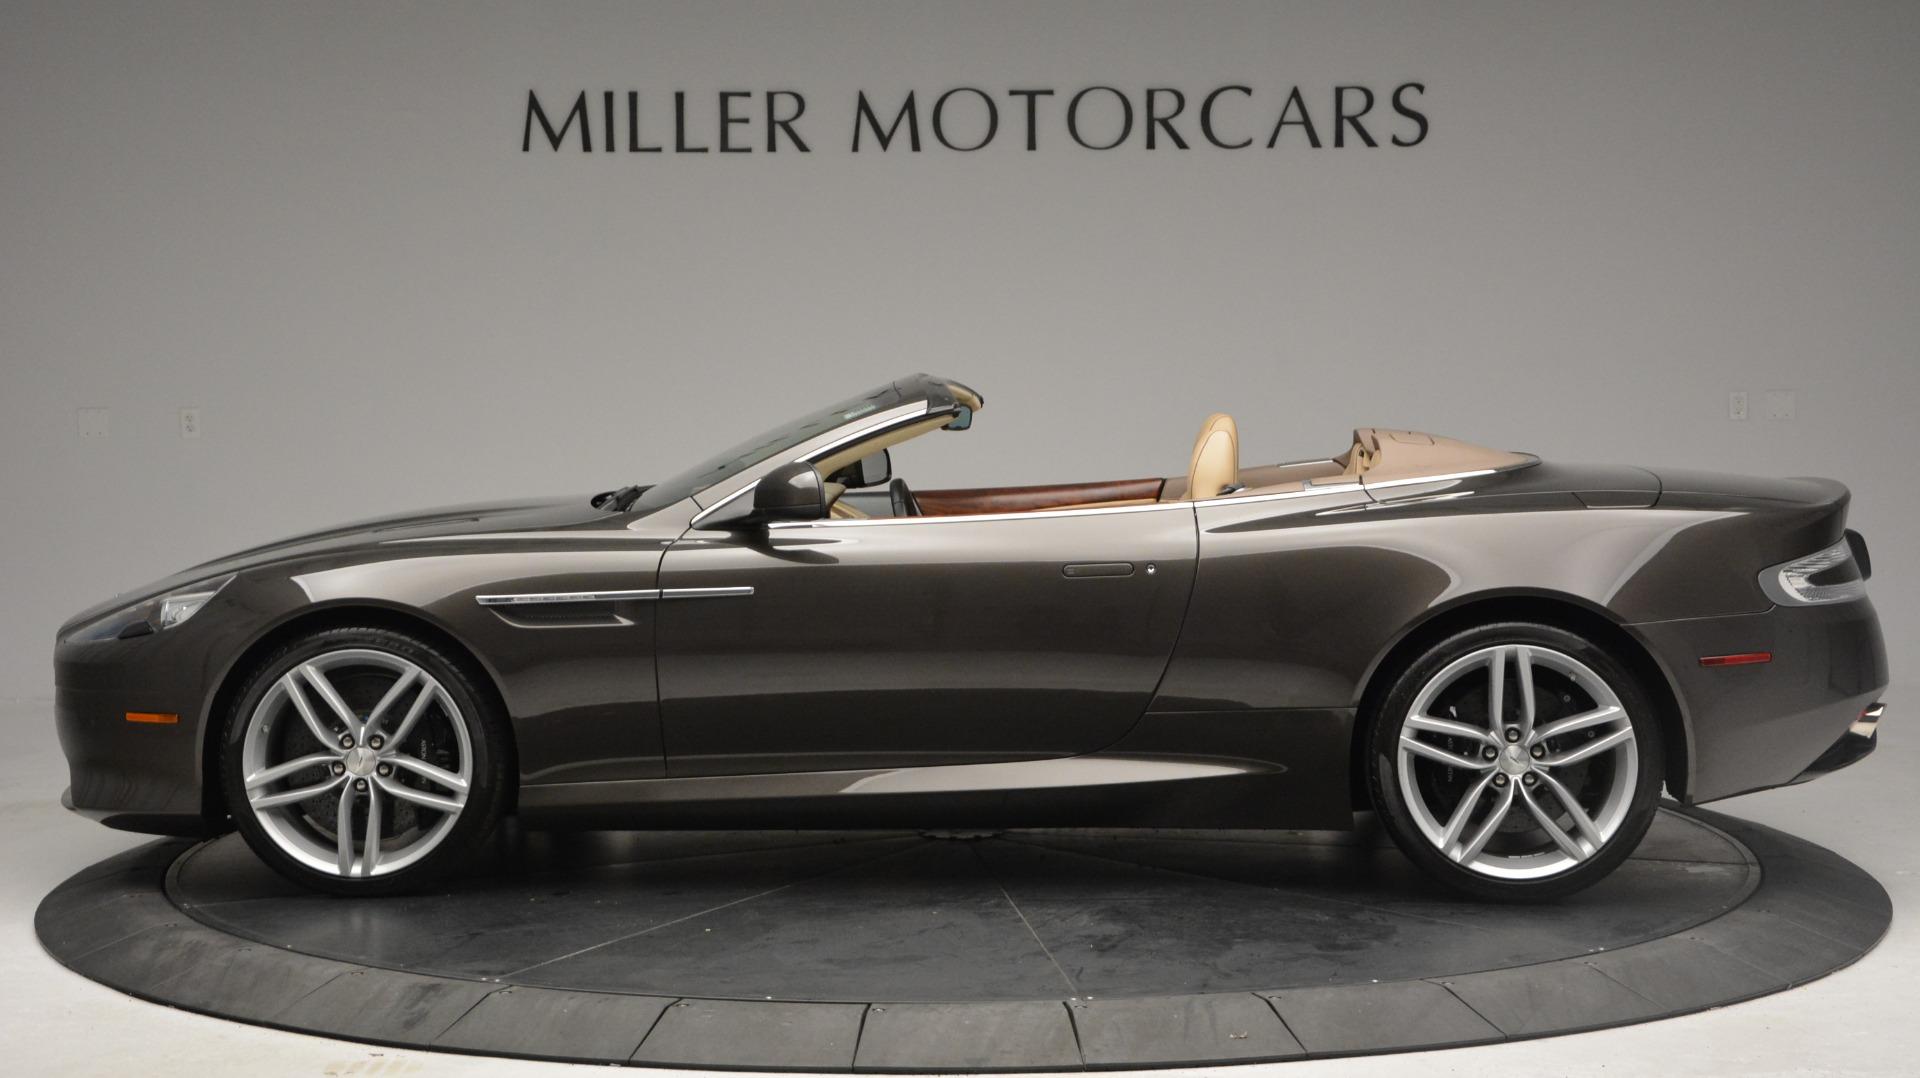 Used 2012 Aston Martin Virage Convertible For Sale In Greenwich, CT. Alfa Romeo of Greenwich, 7613 3351_p3